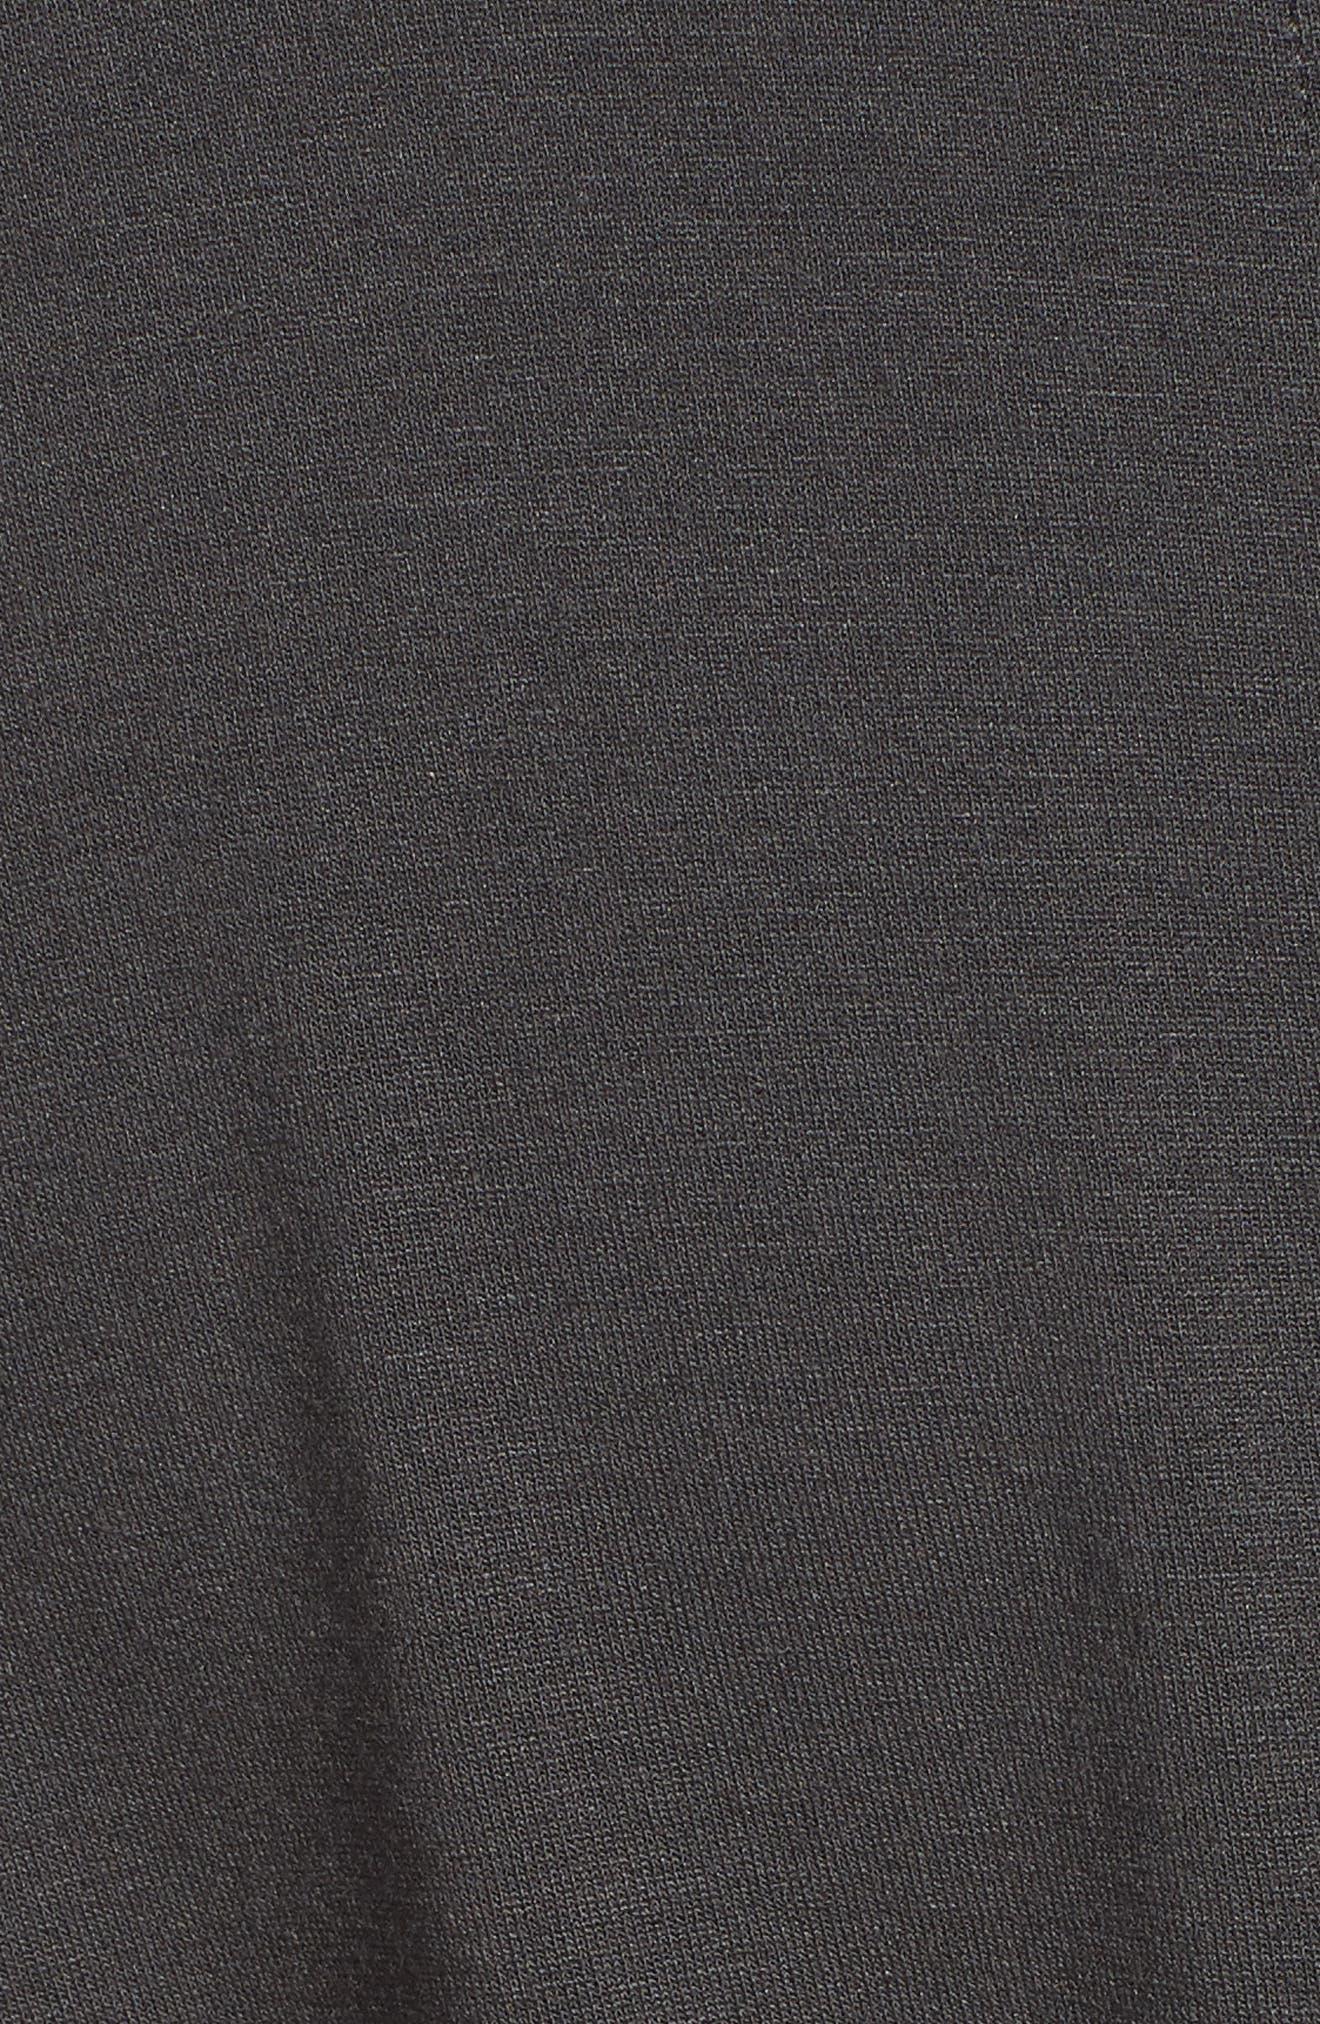 Tie Back Dress,                             Alternate thumbnail 6, color,                             025